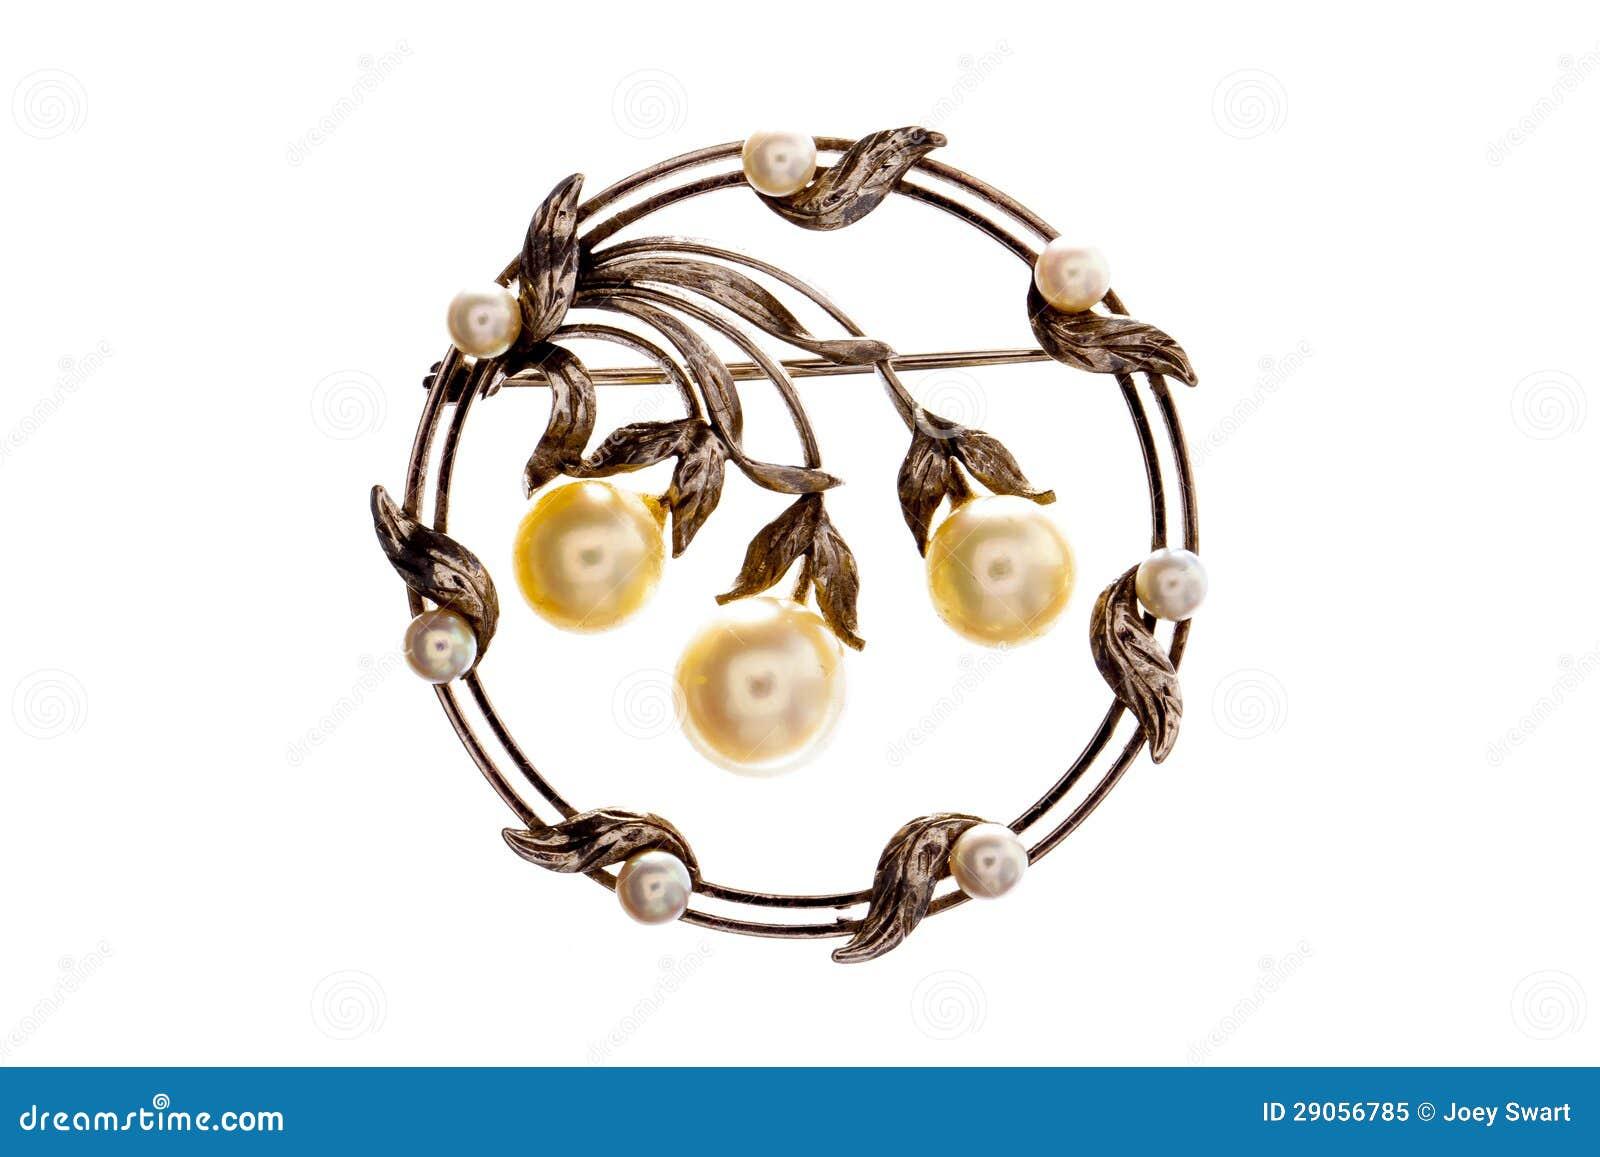 Victorian pearl broach.